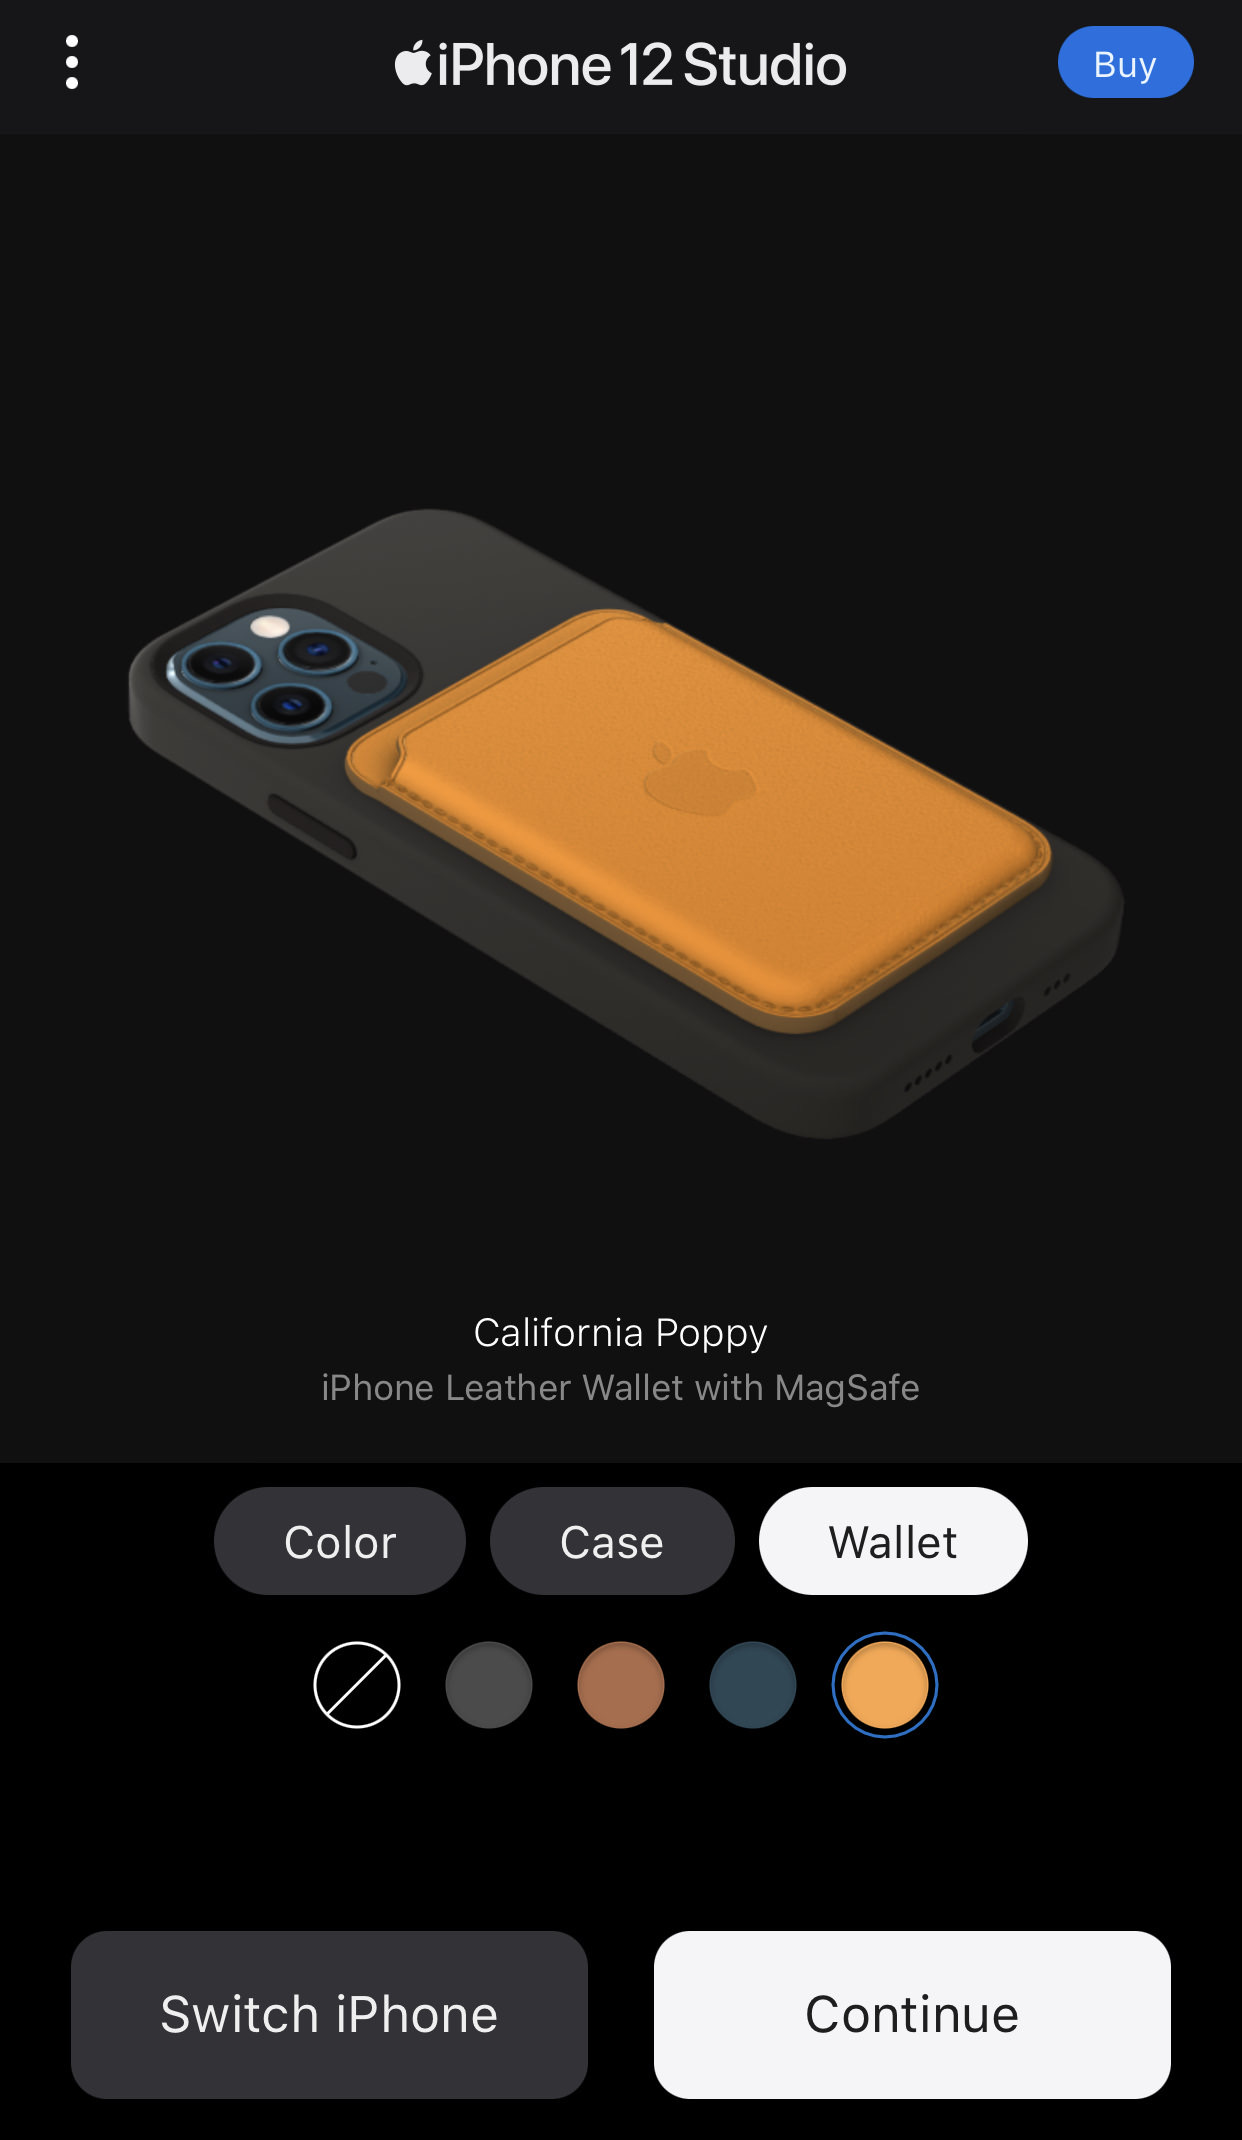 Iphone12studio 202011 3